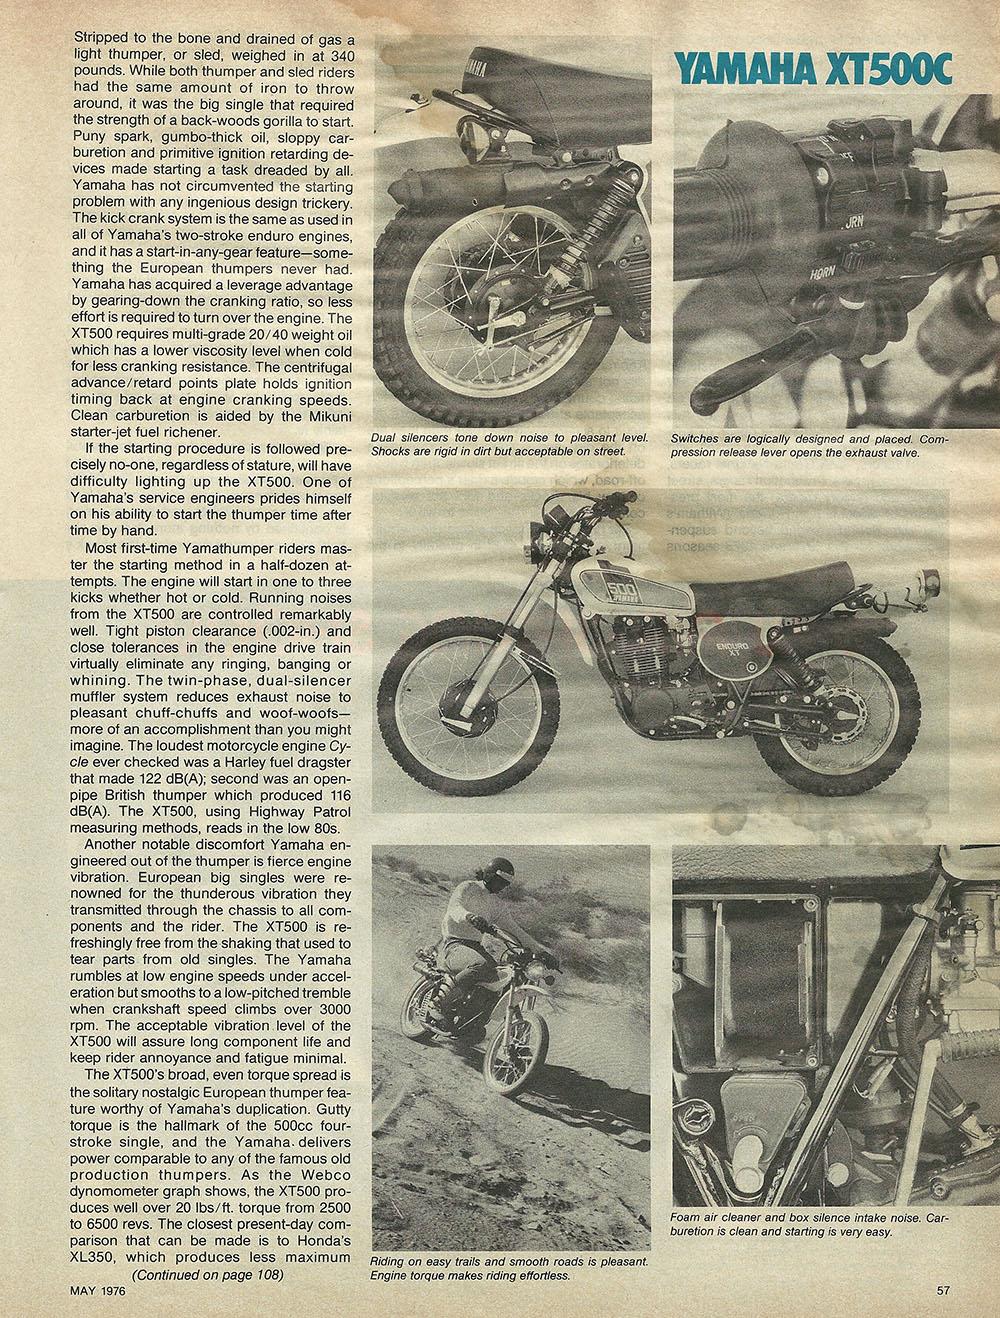 1976 Yamaha XT500C off road test 5.JPG